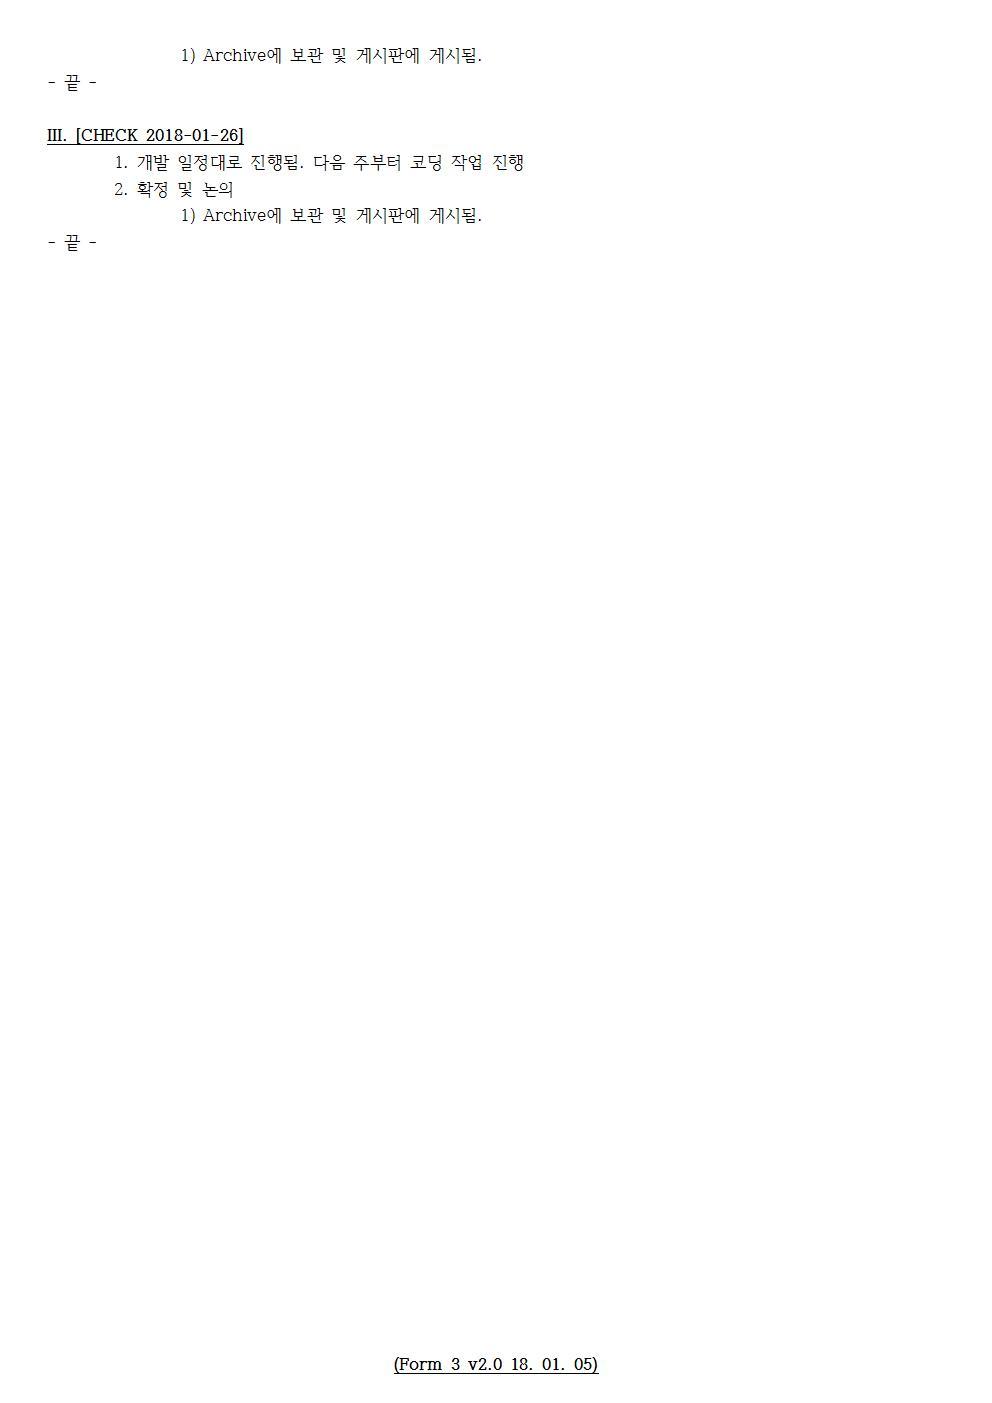 D-[18-001-RD-01]-[SAVE 3.0]-[2018-01-26][SH]002.jpg